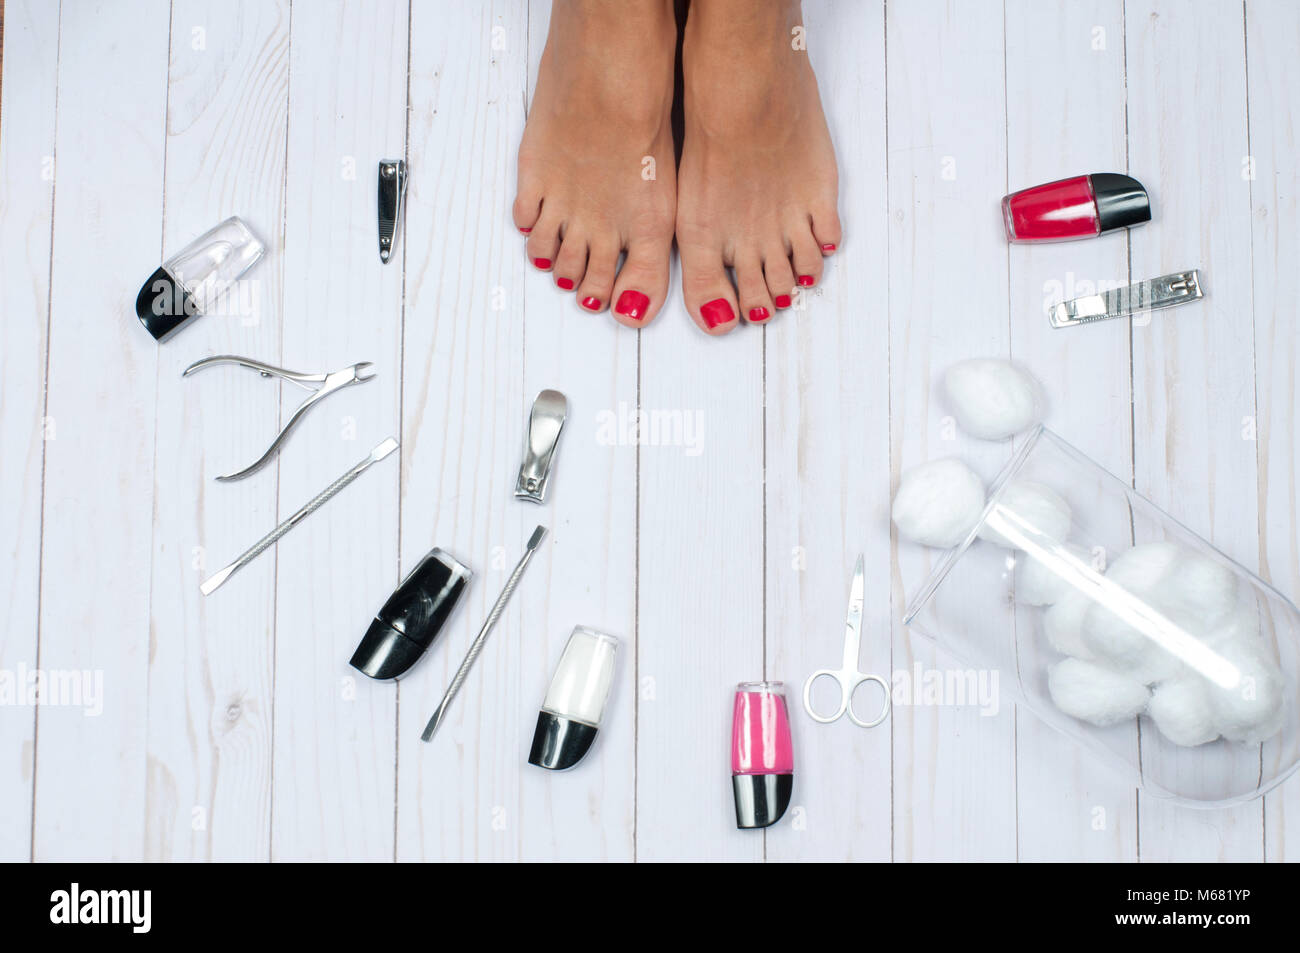 foot care treatment and nail  beautiful female feet at spa salon on  pedicure procedure -